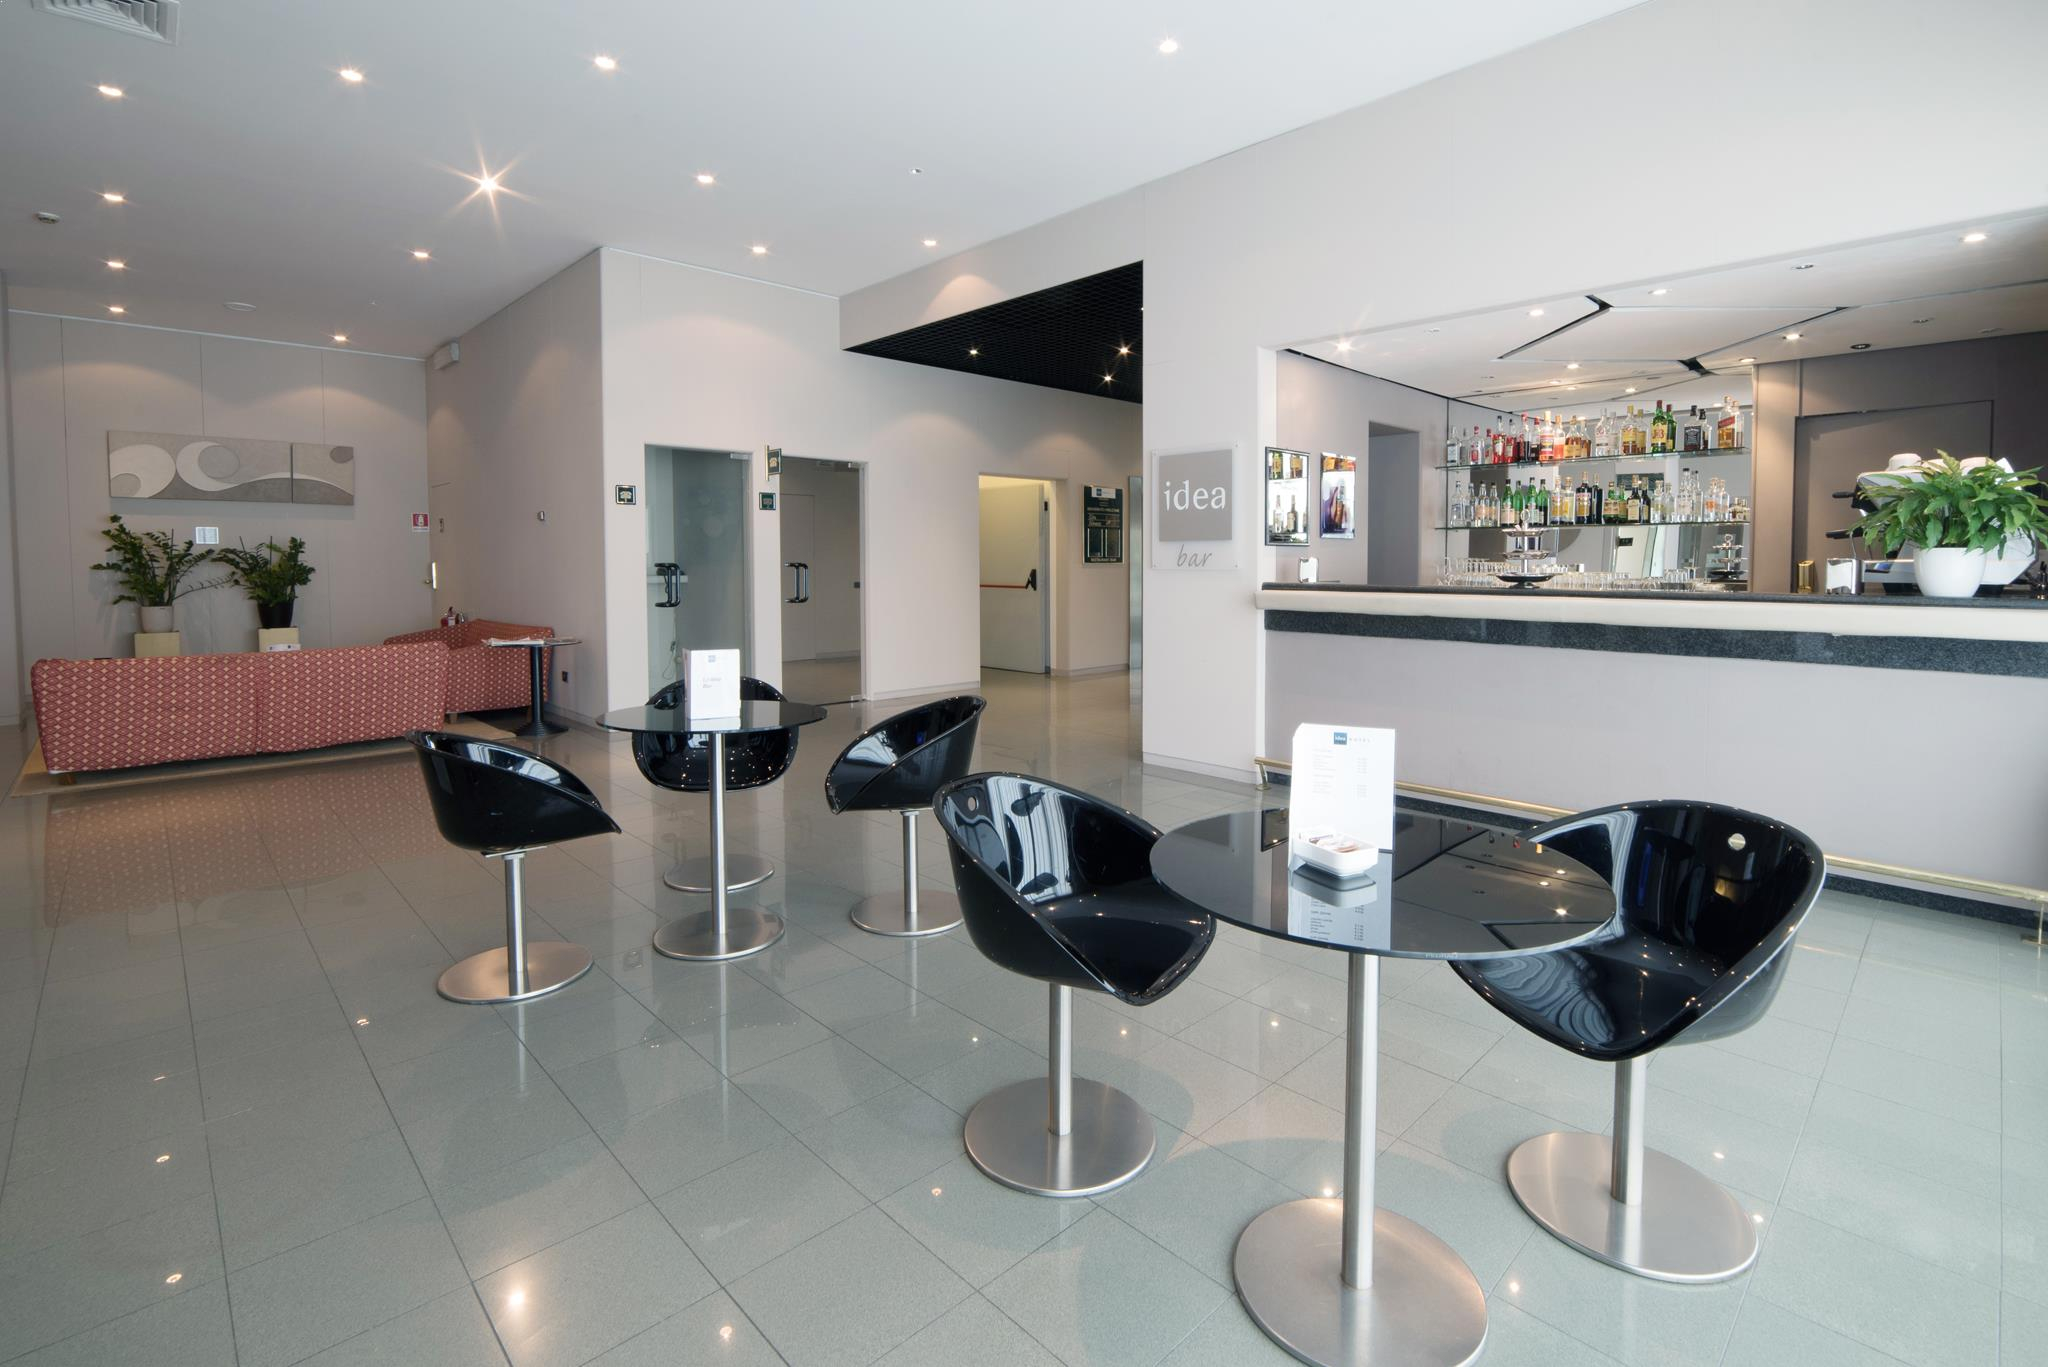 Bar Idea Hotel Piacenza